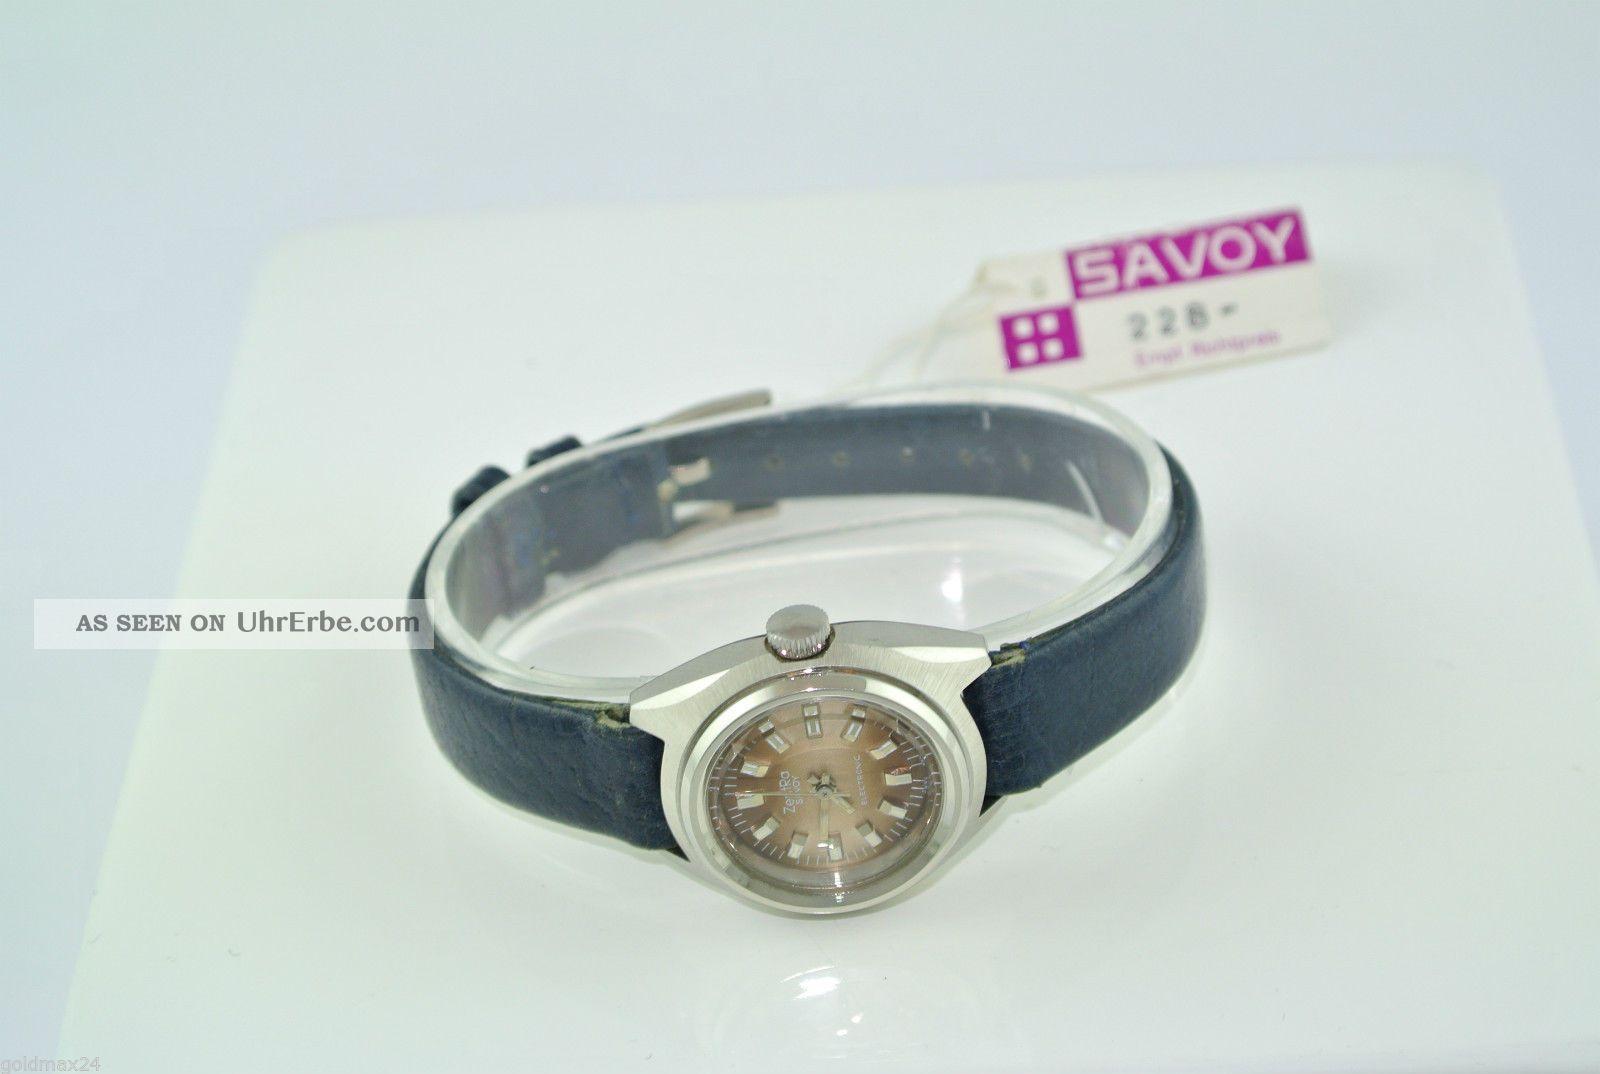 Zentra - Savoy - Automatik - Damenarmbanduhr / Lederarmband Armbanduhren Bild